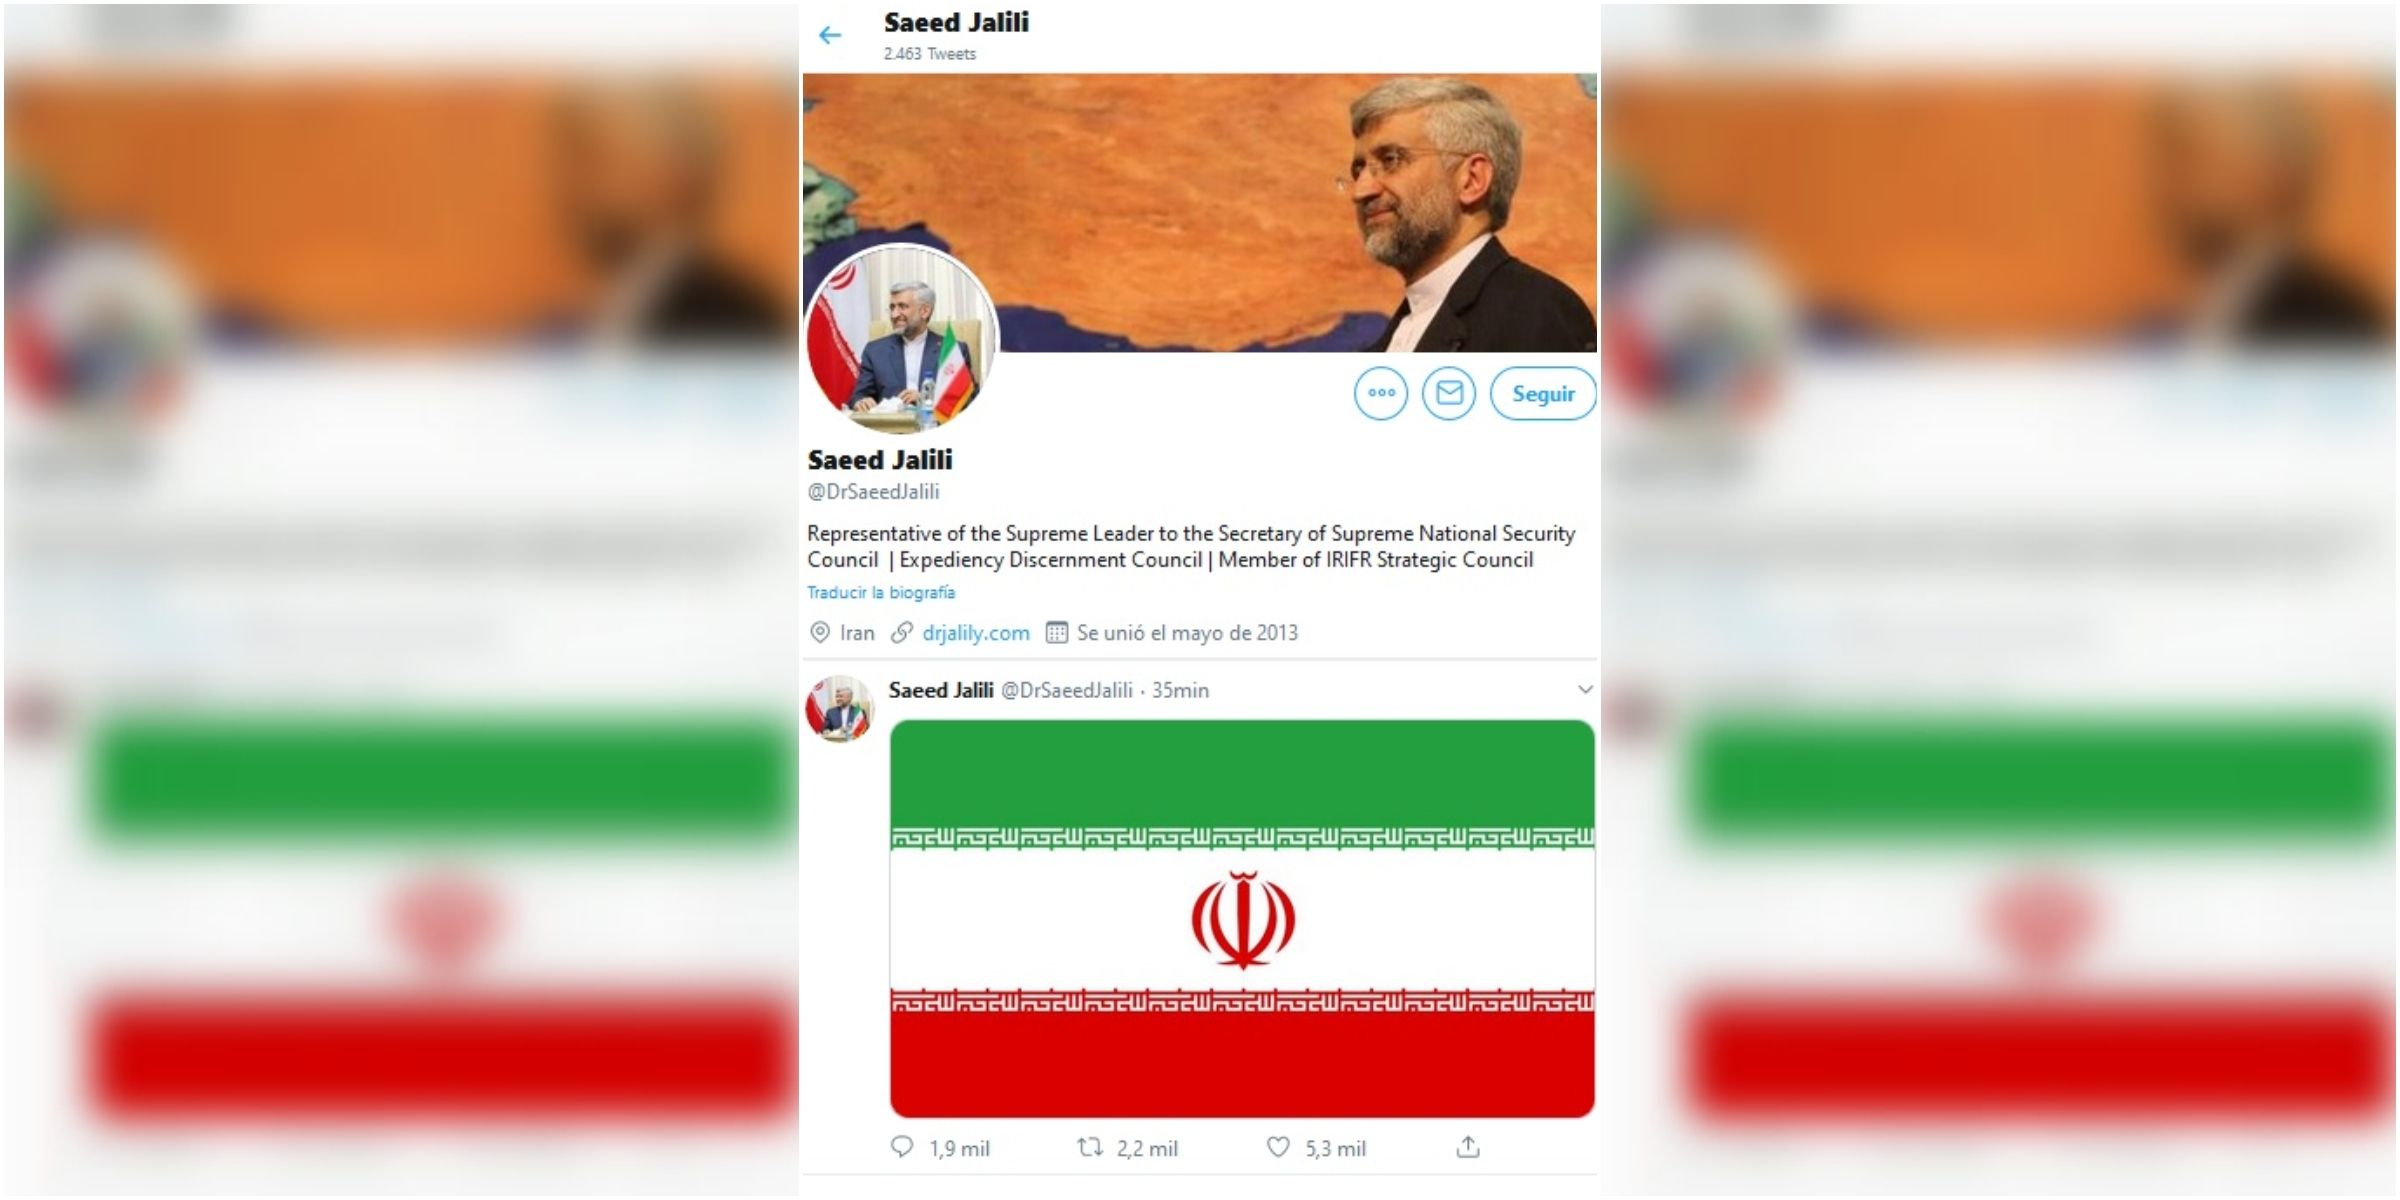 Saeed Jalili y el tuit que emuló al de Donald Trump